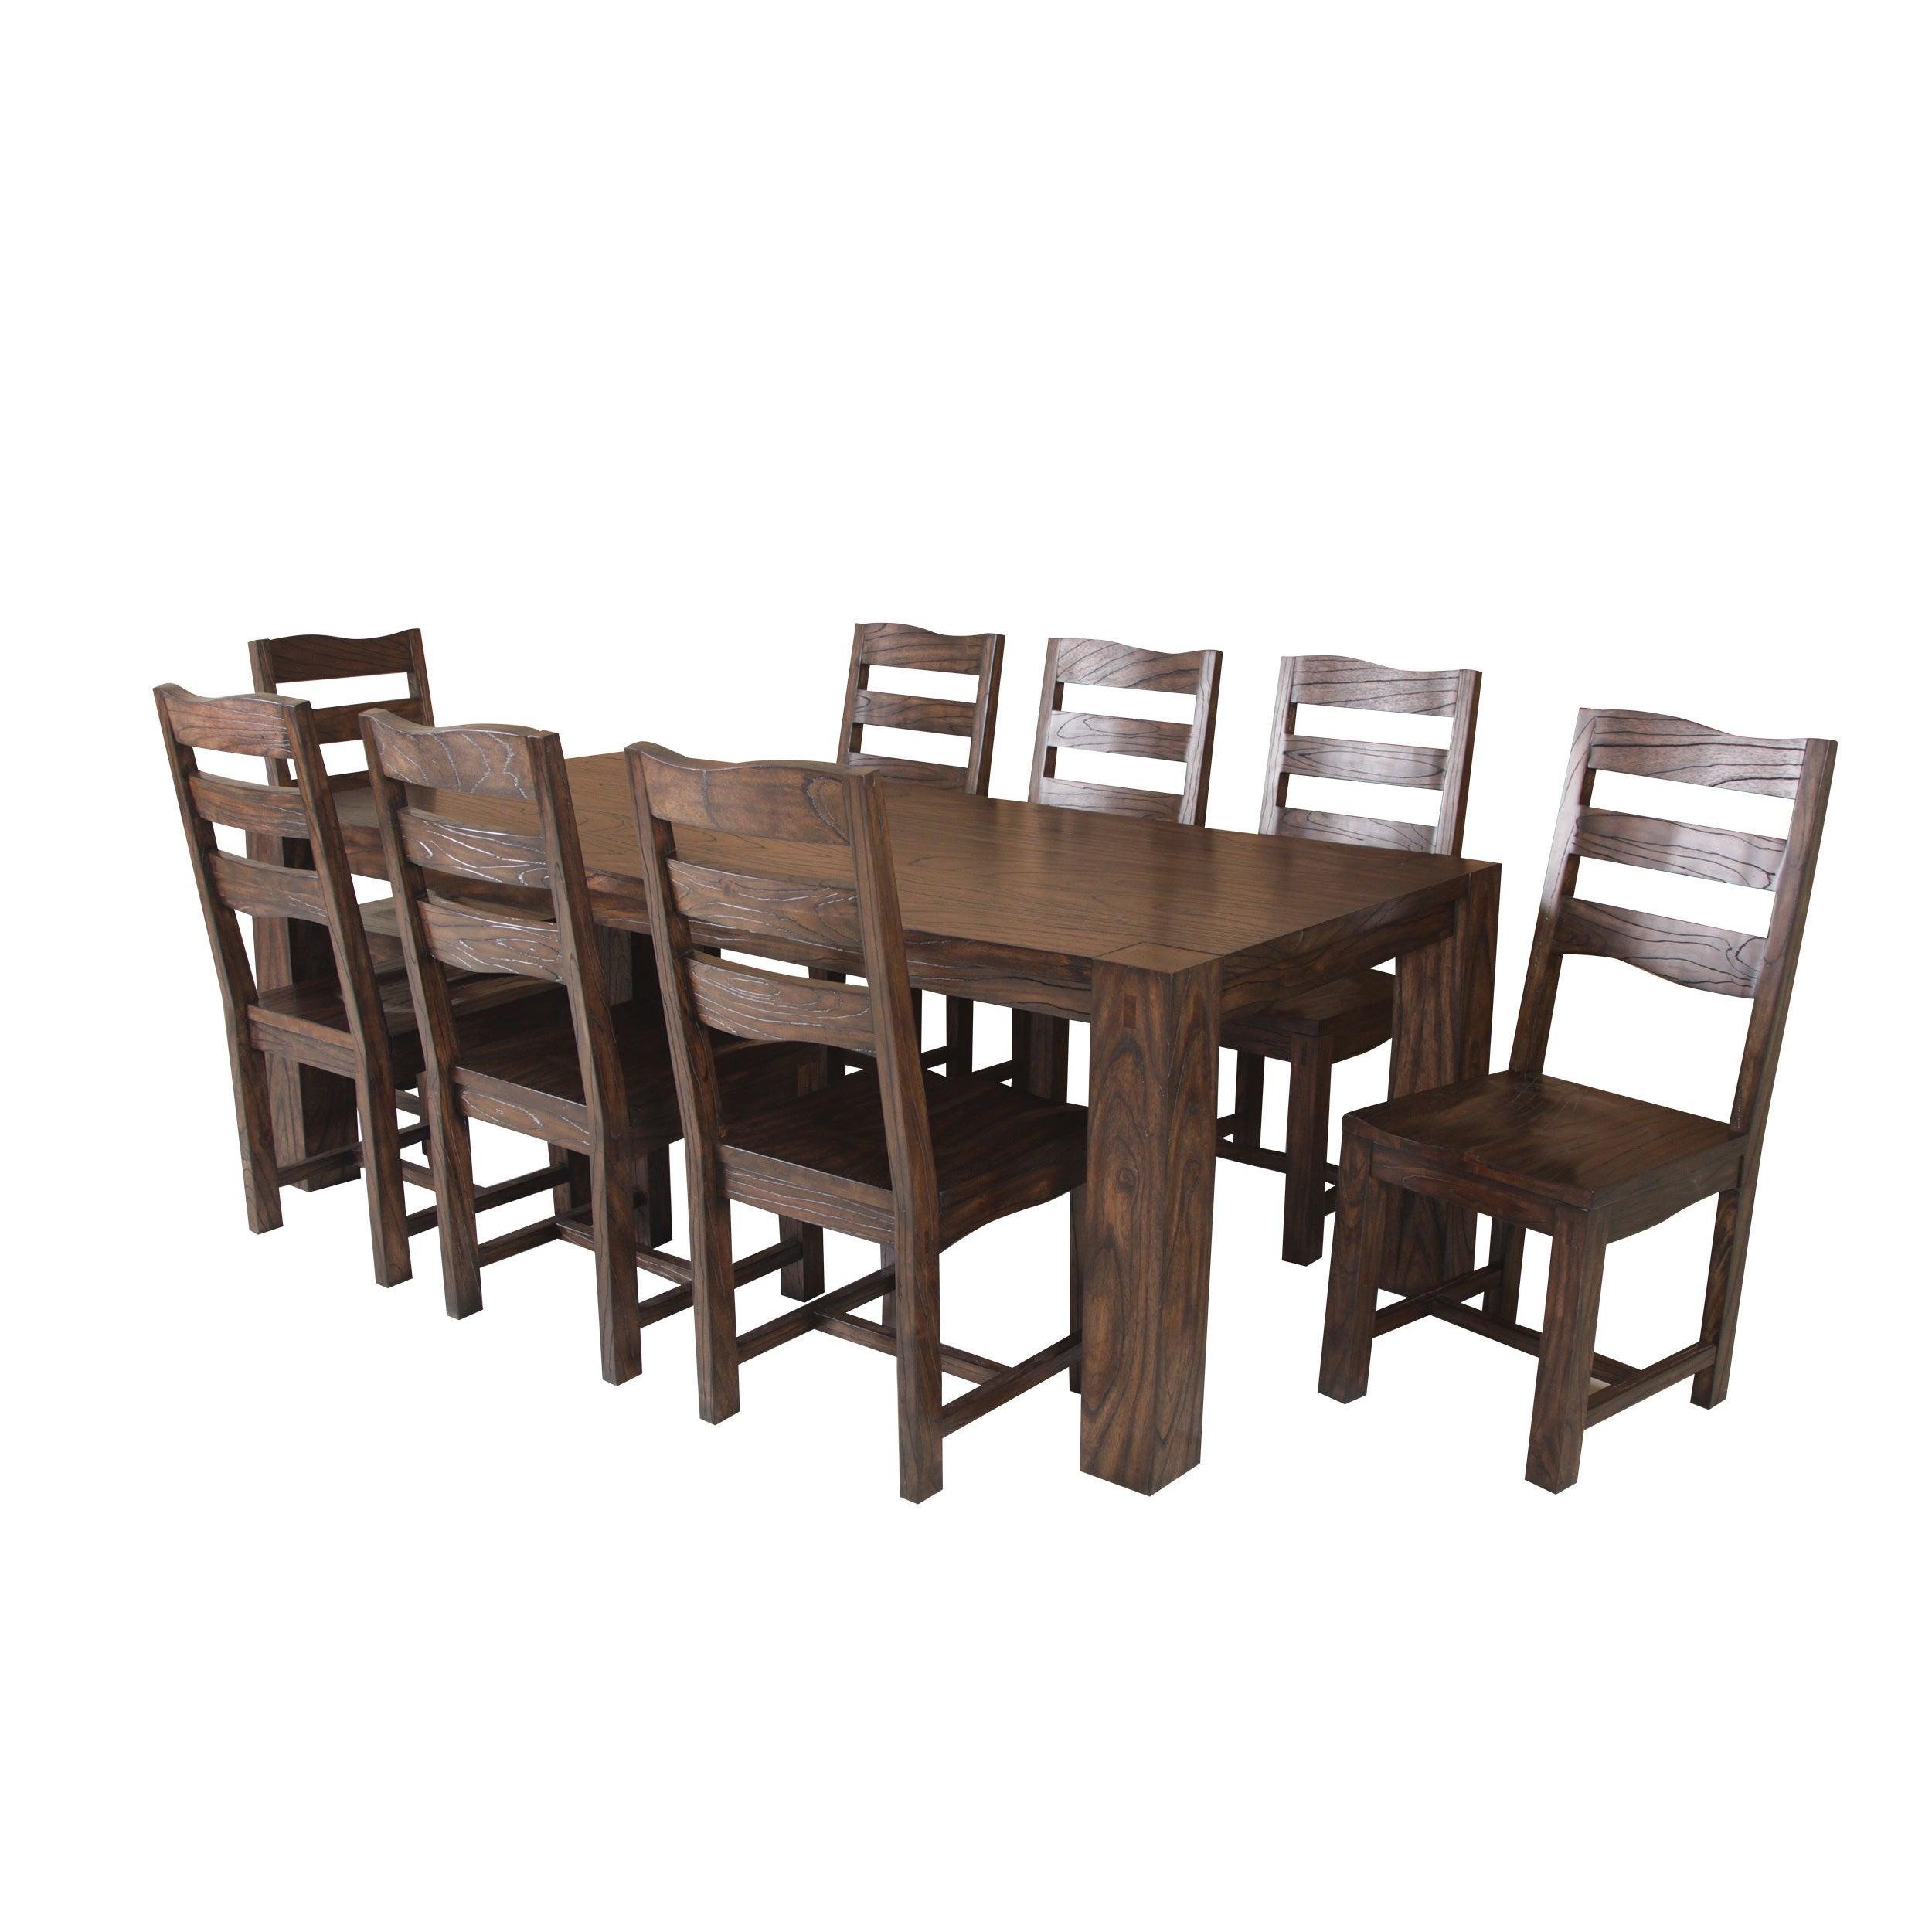 Coaster Company Calabasas Wood Dining Table Brown Free Shipping Today 19064319